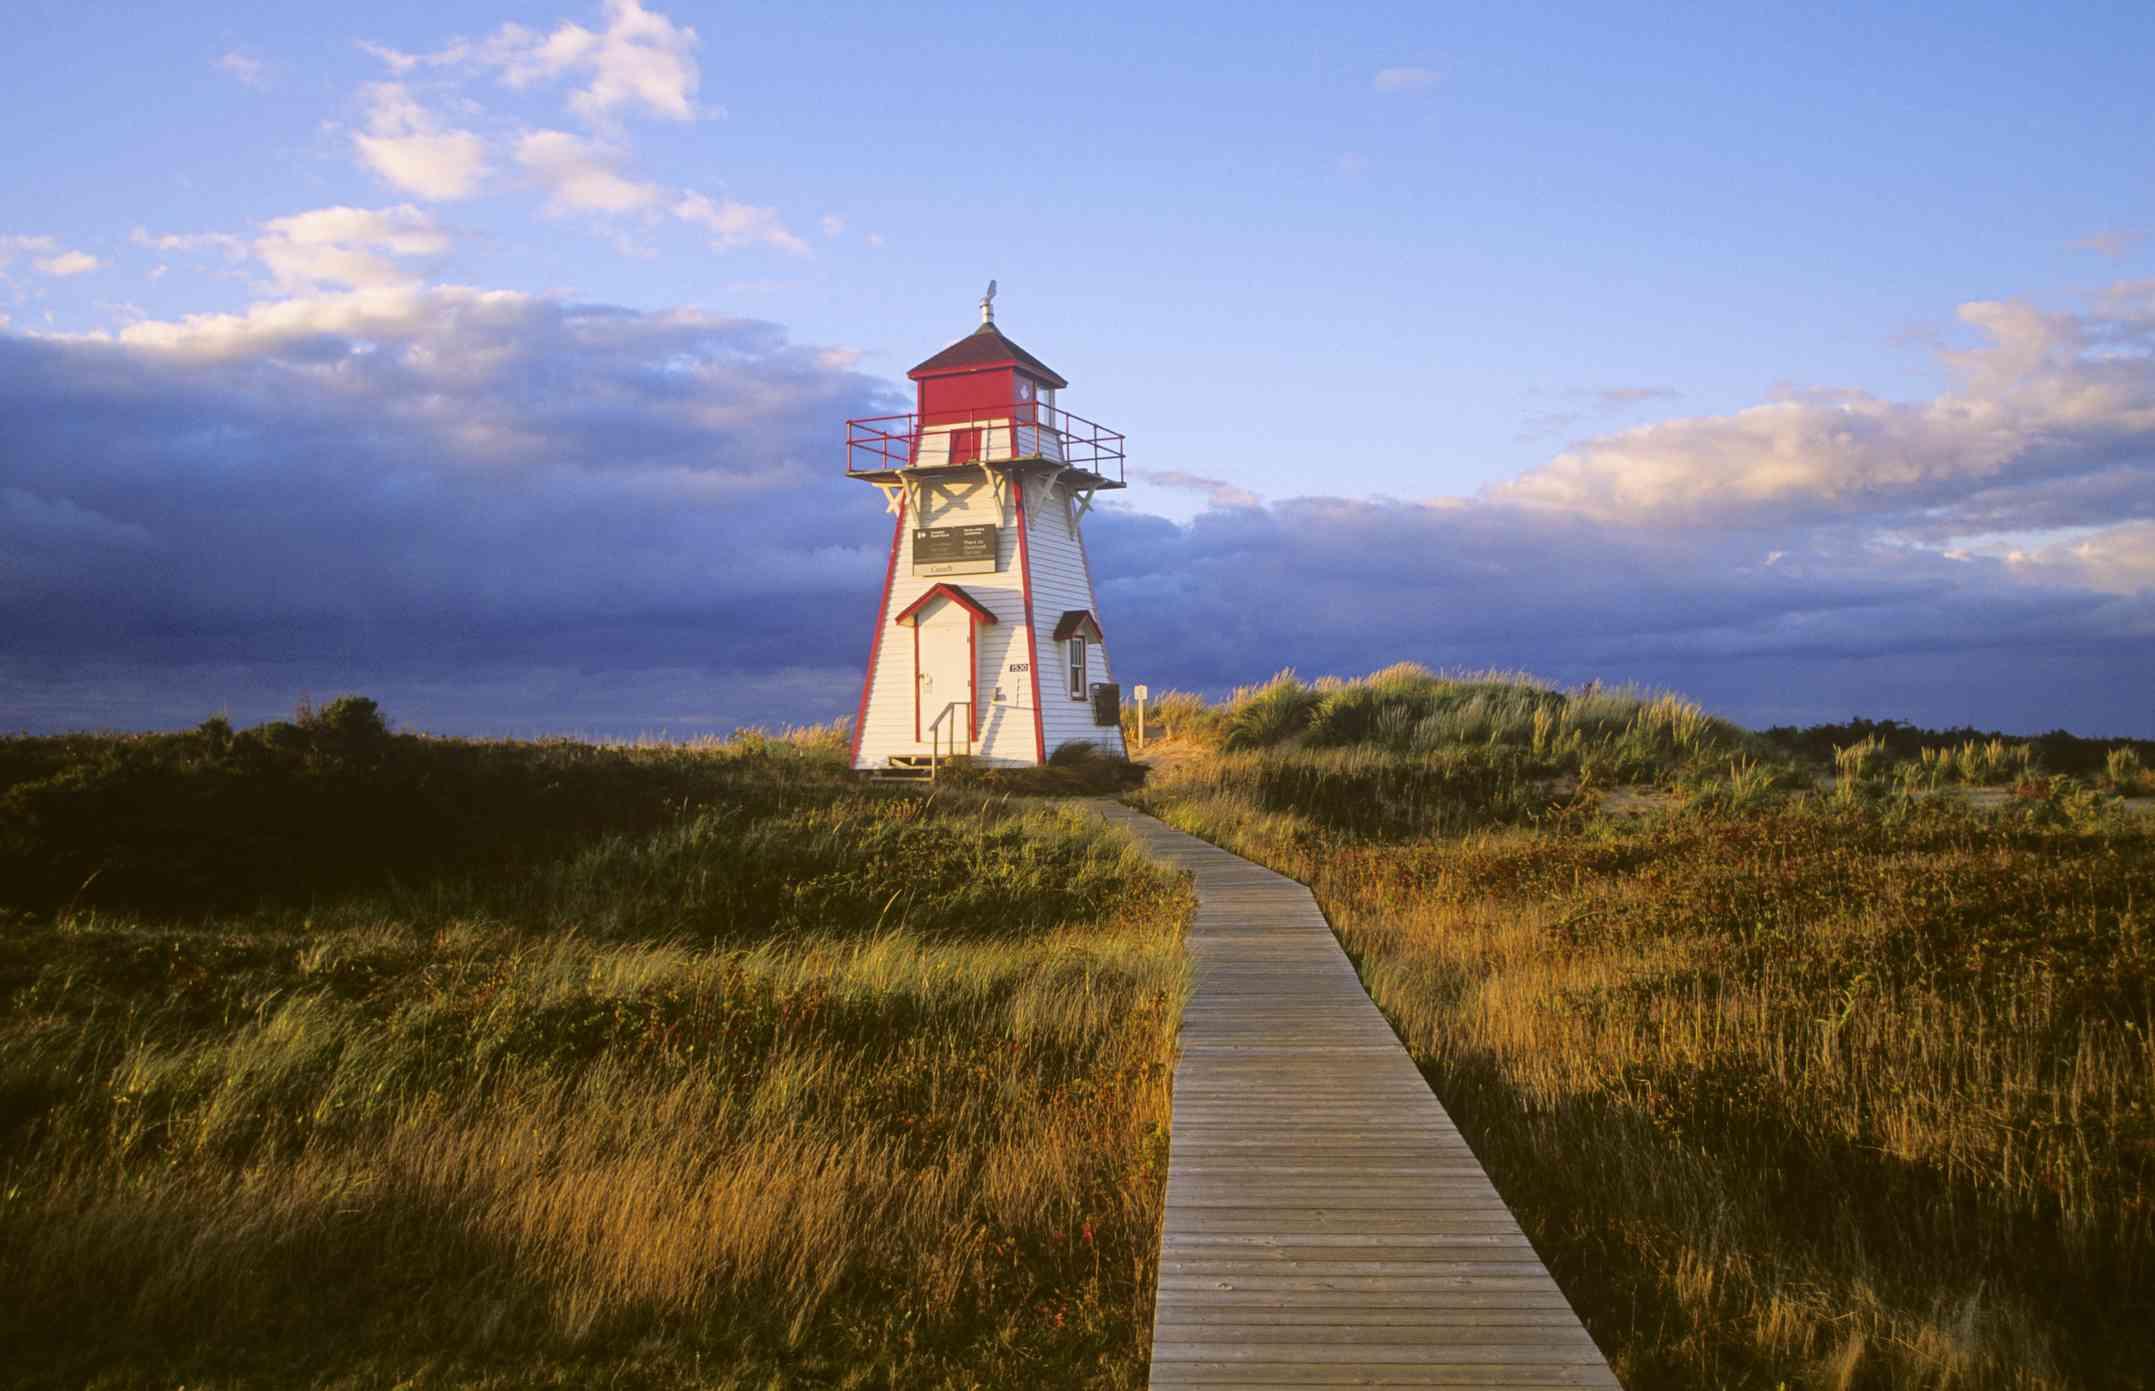 Covehead Lighthouse, Prince Edward Island National Park, Prince Edward Island, Canada.